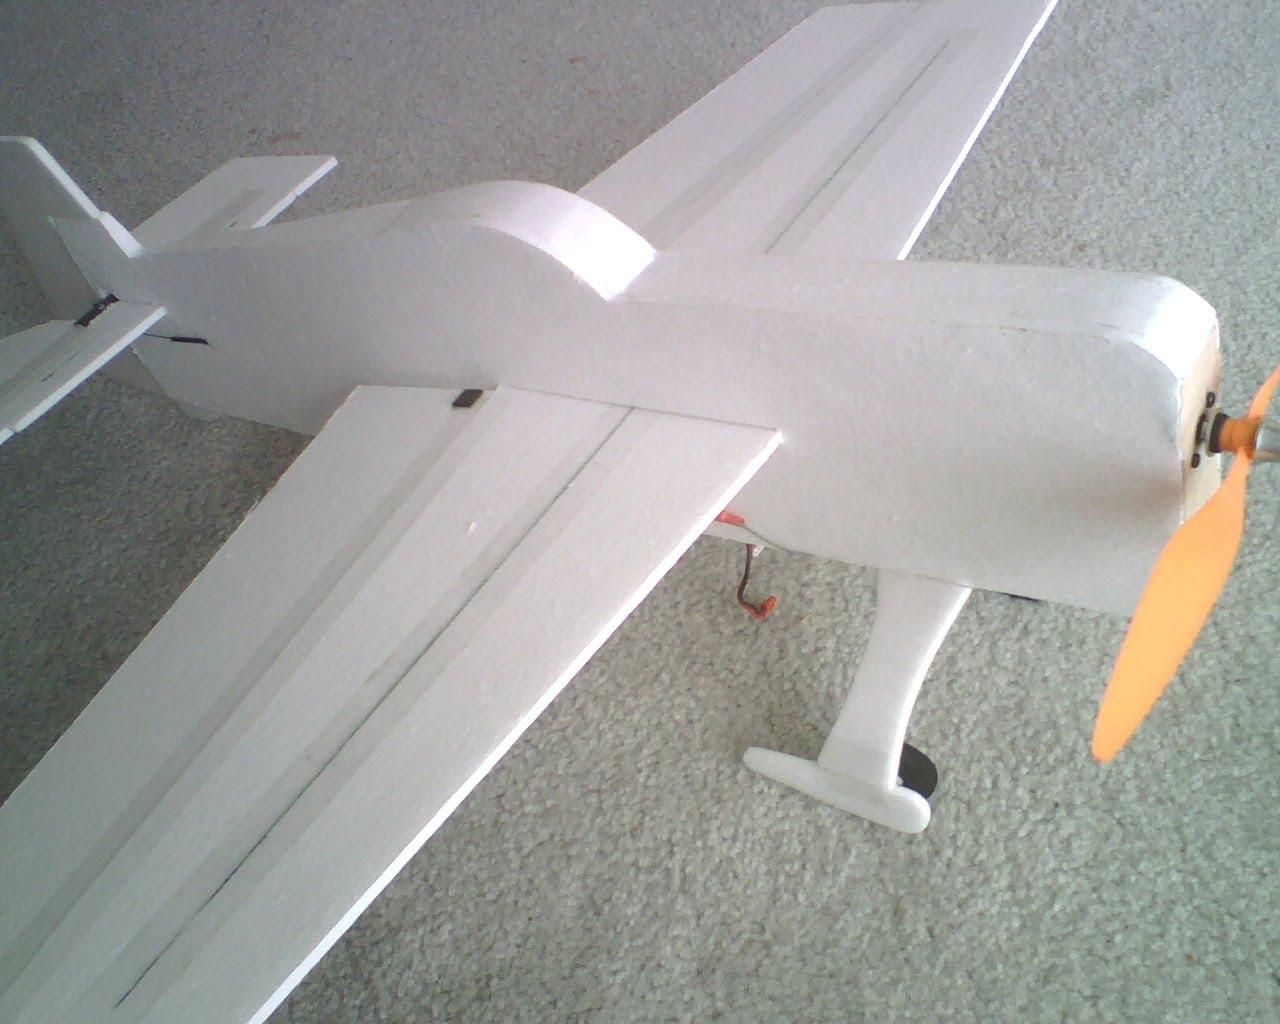 foamy airplane